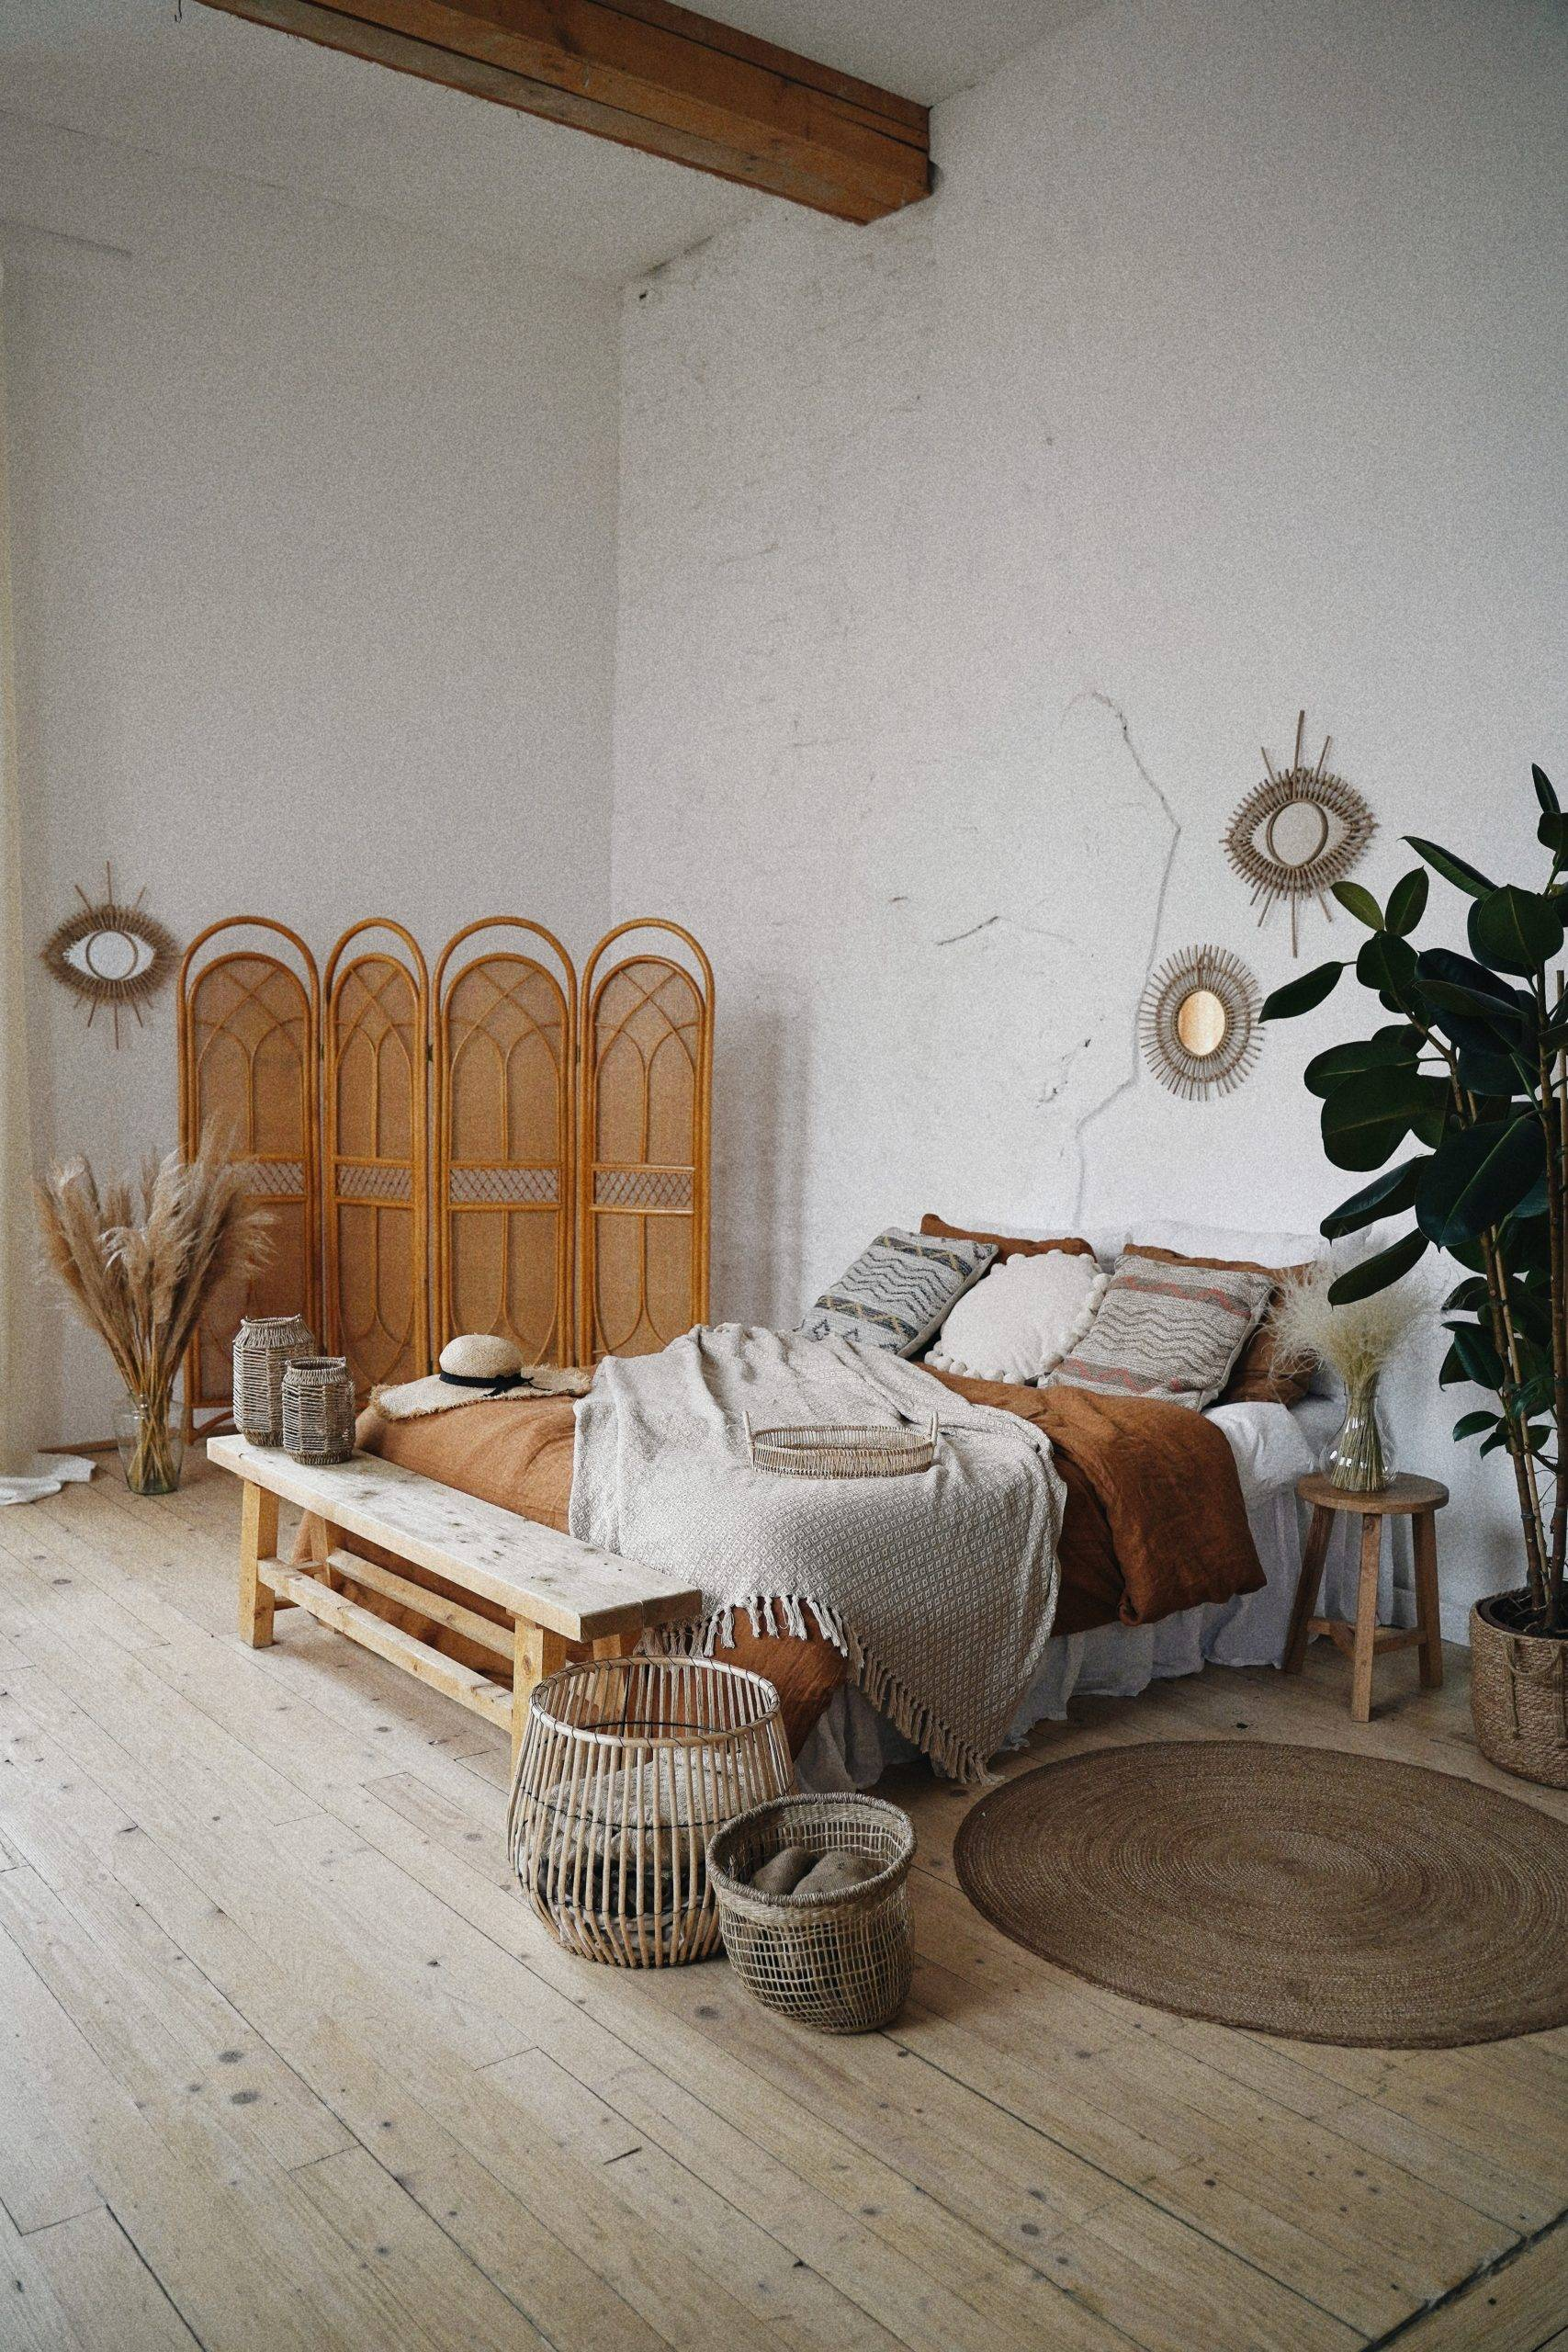 Minimalist room design with an eye wall decor